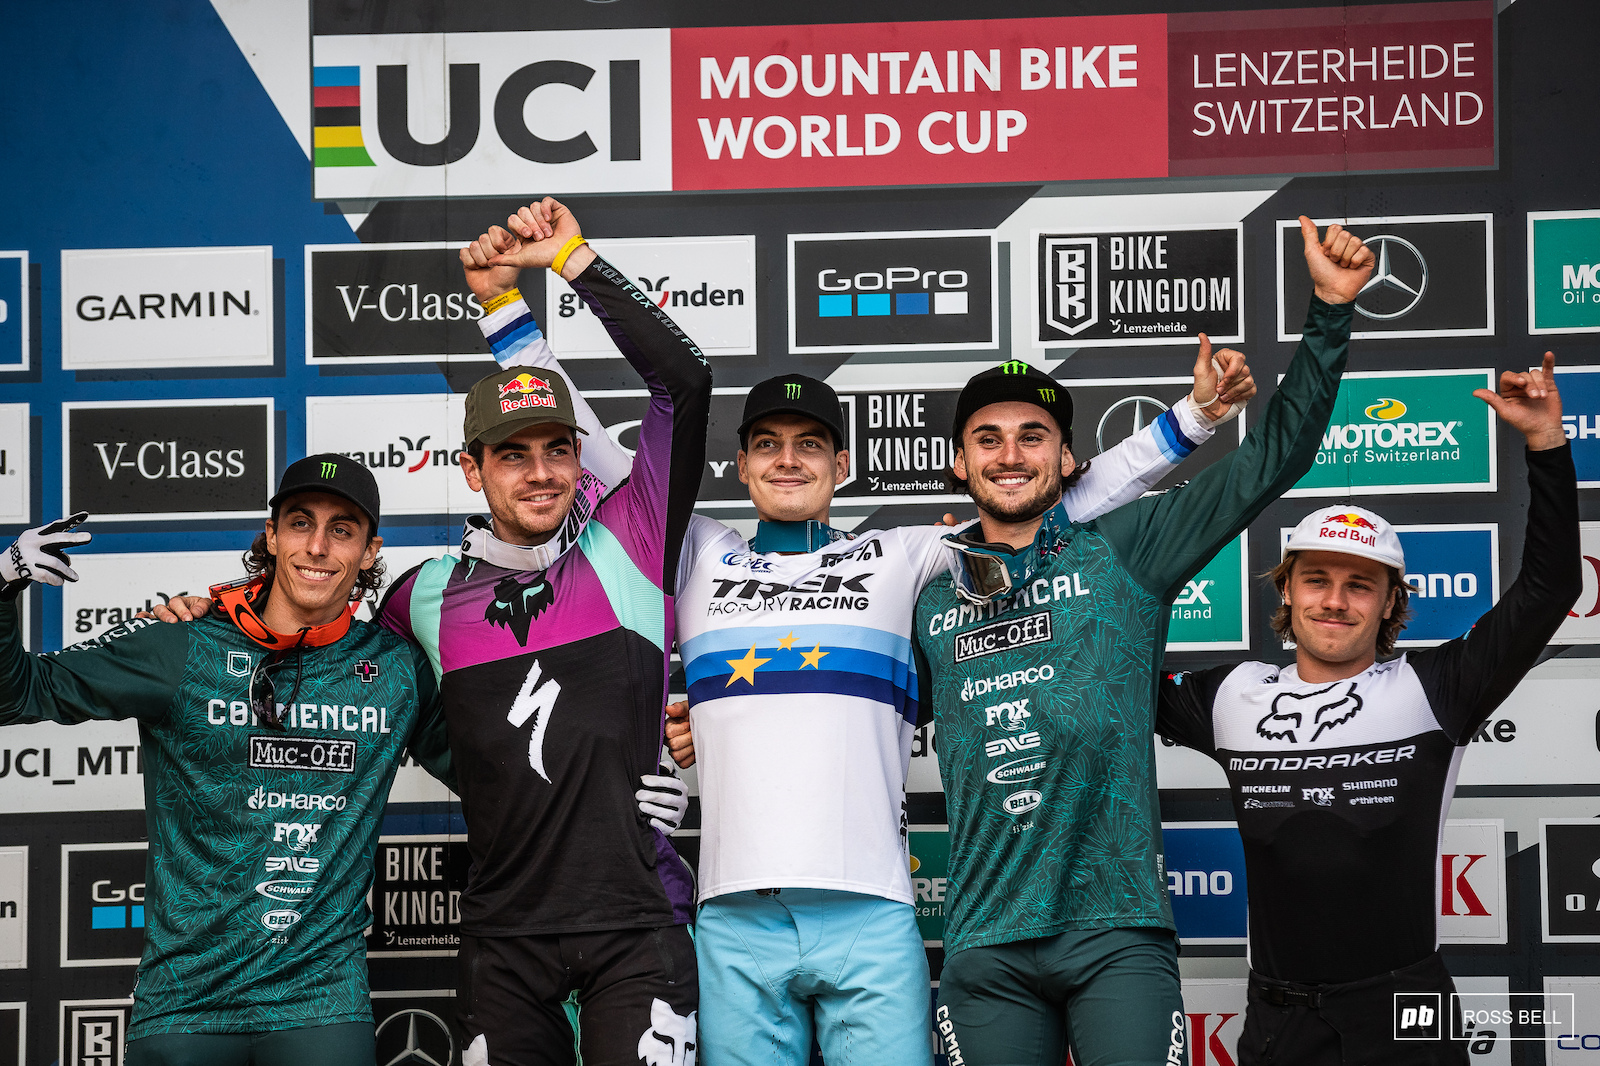 Your top 5 elite men 1st Loris Vergier 2nd Loic Bruni 3rd Thibaut Daprela 4th Amaury Pierron 5th Laurie Greenland.